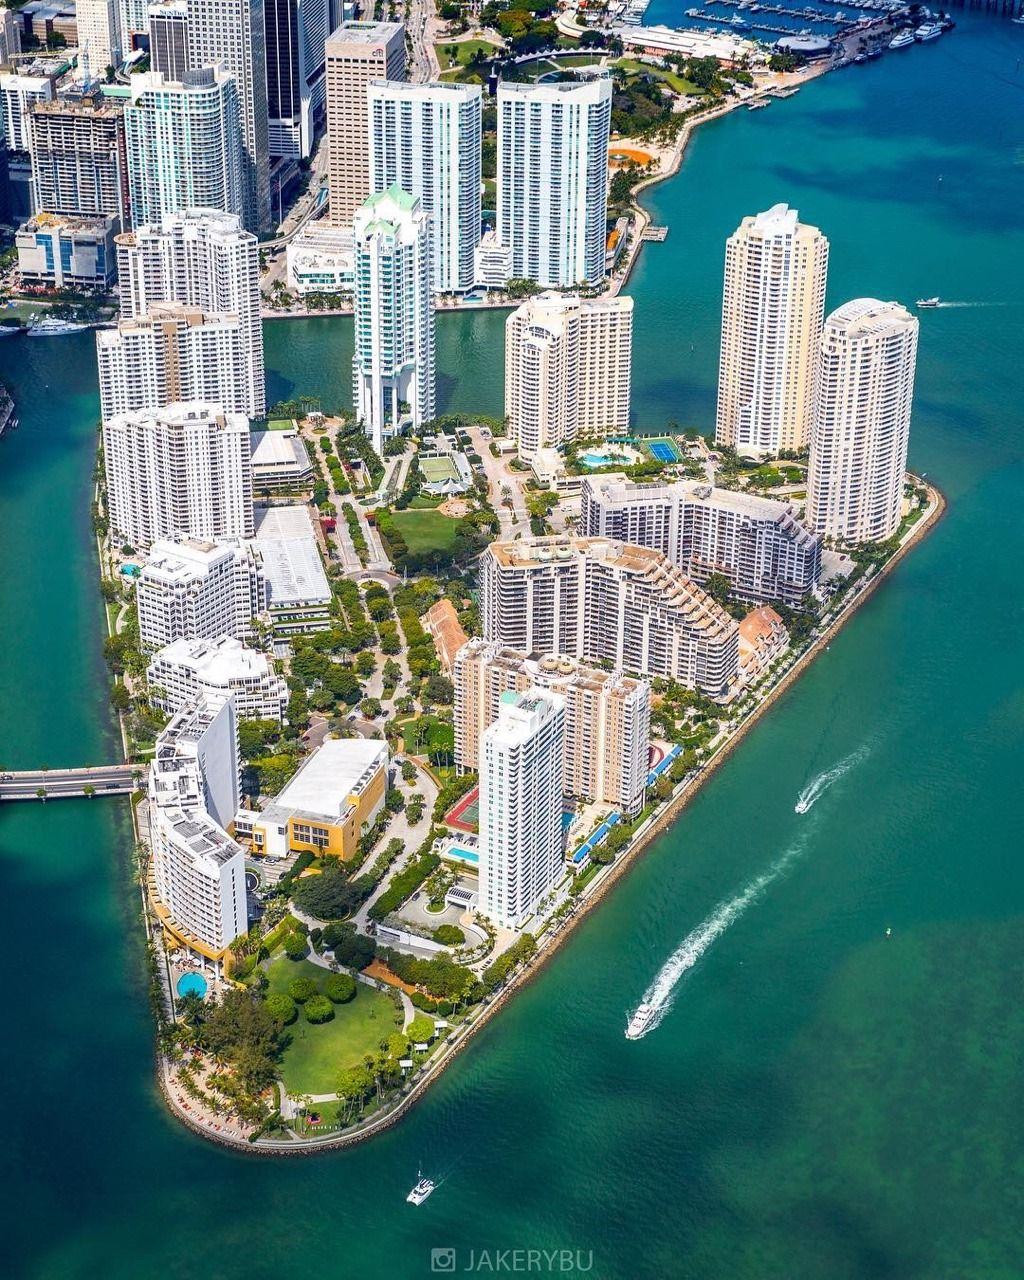 Brickell, Miami By @jakerybu